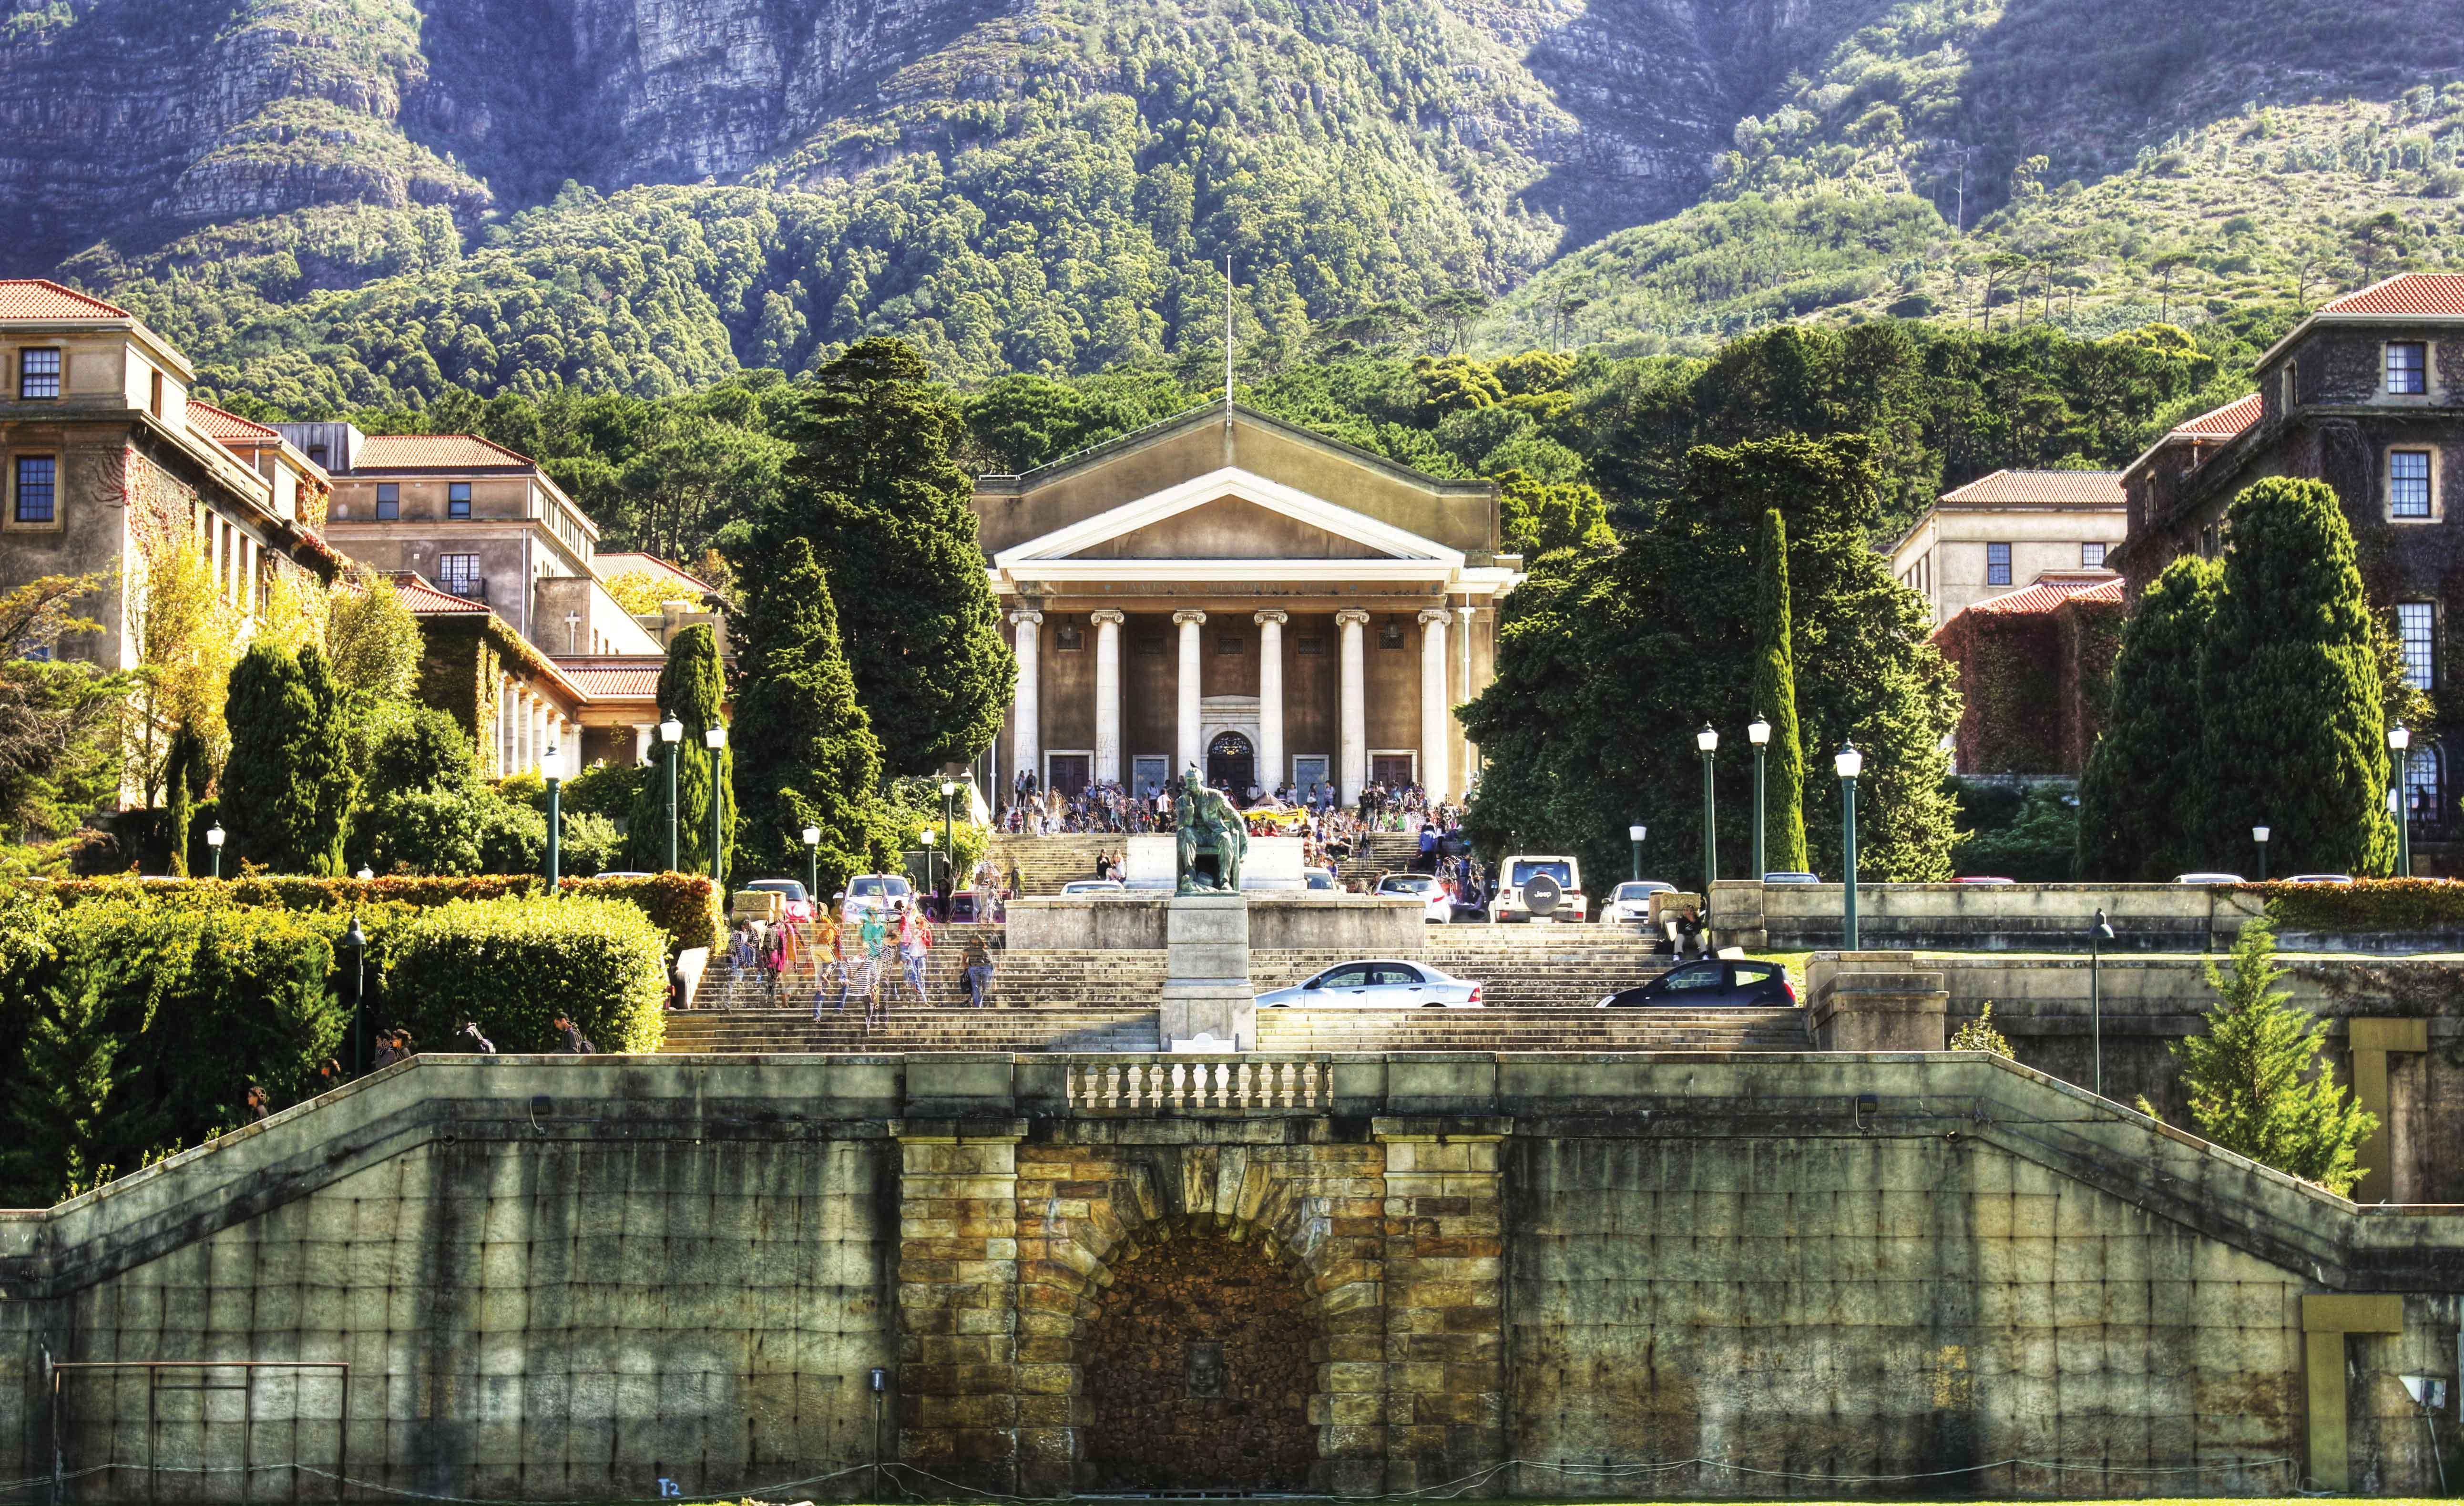 Image: University of Cape Town